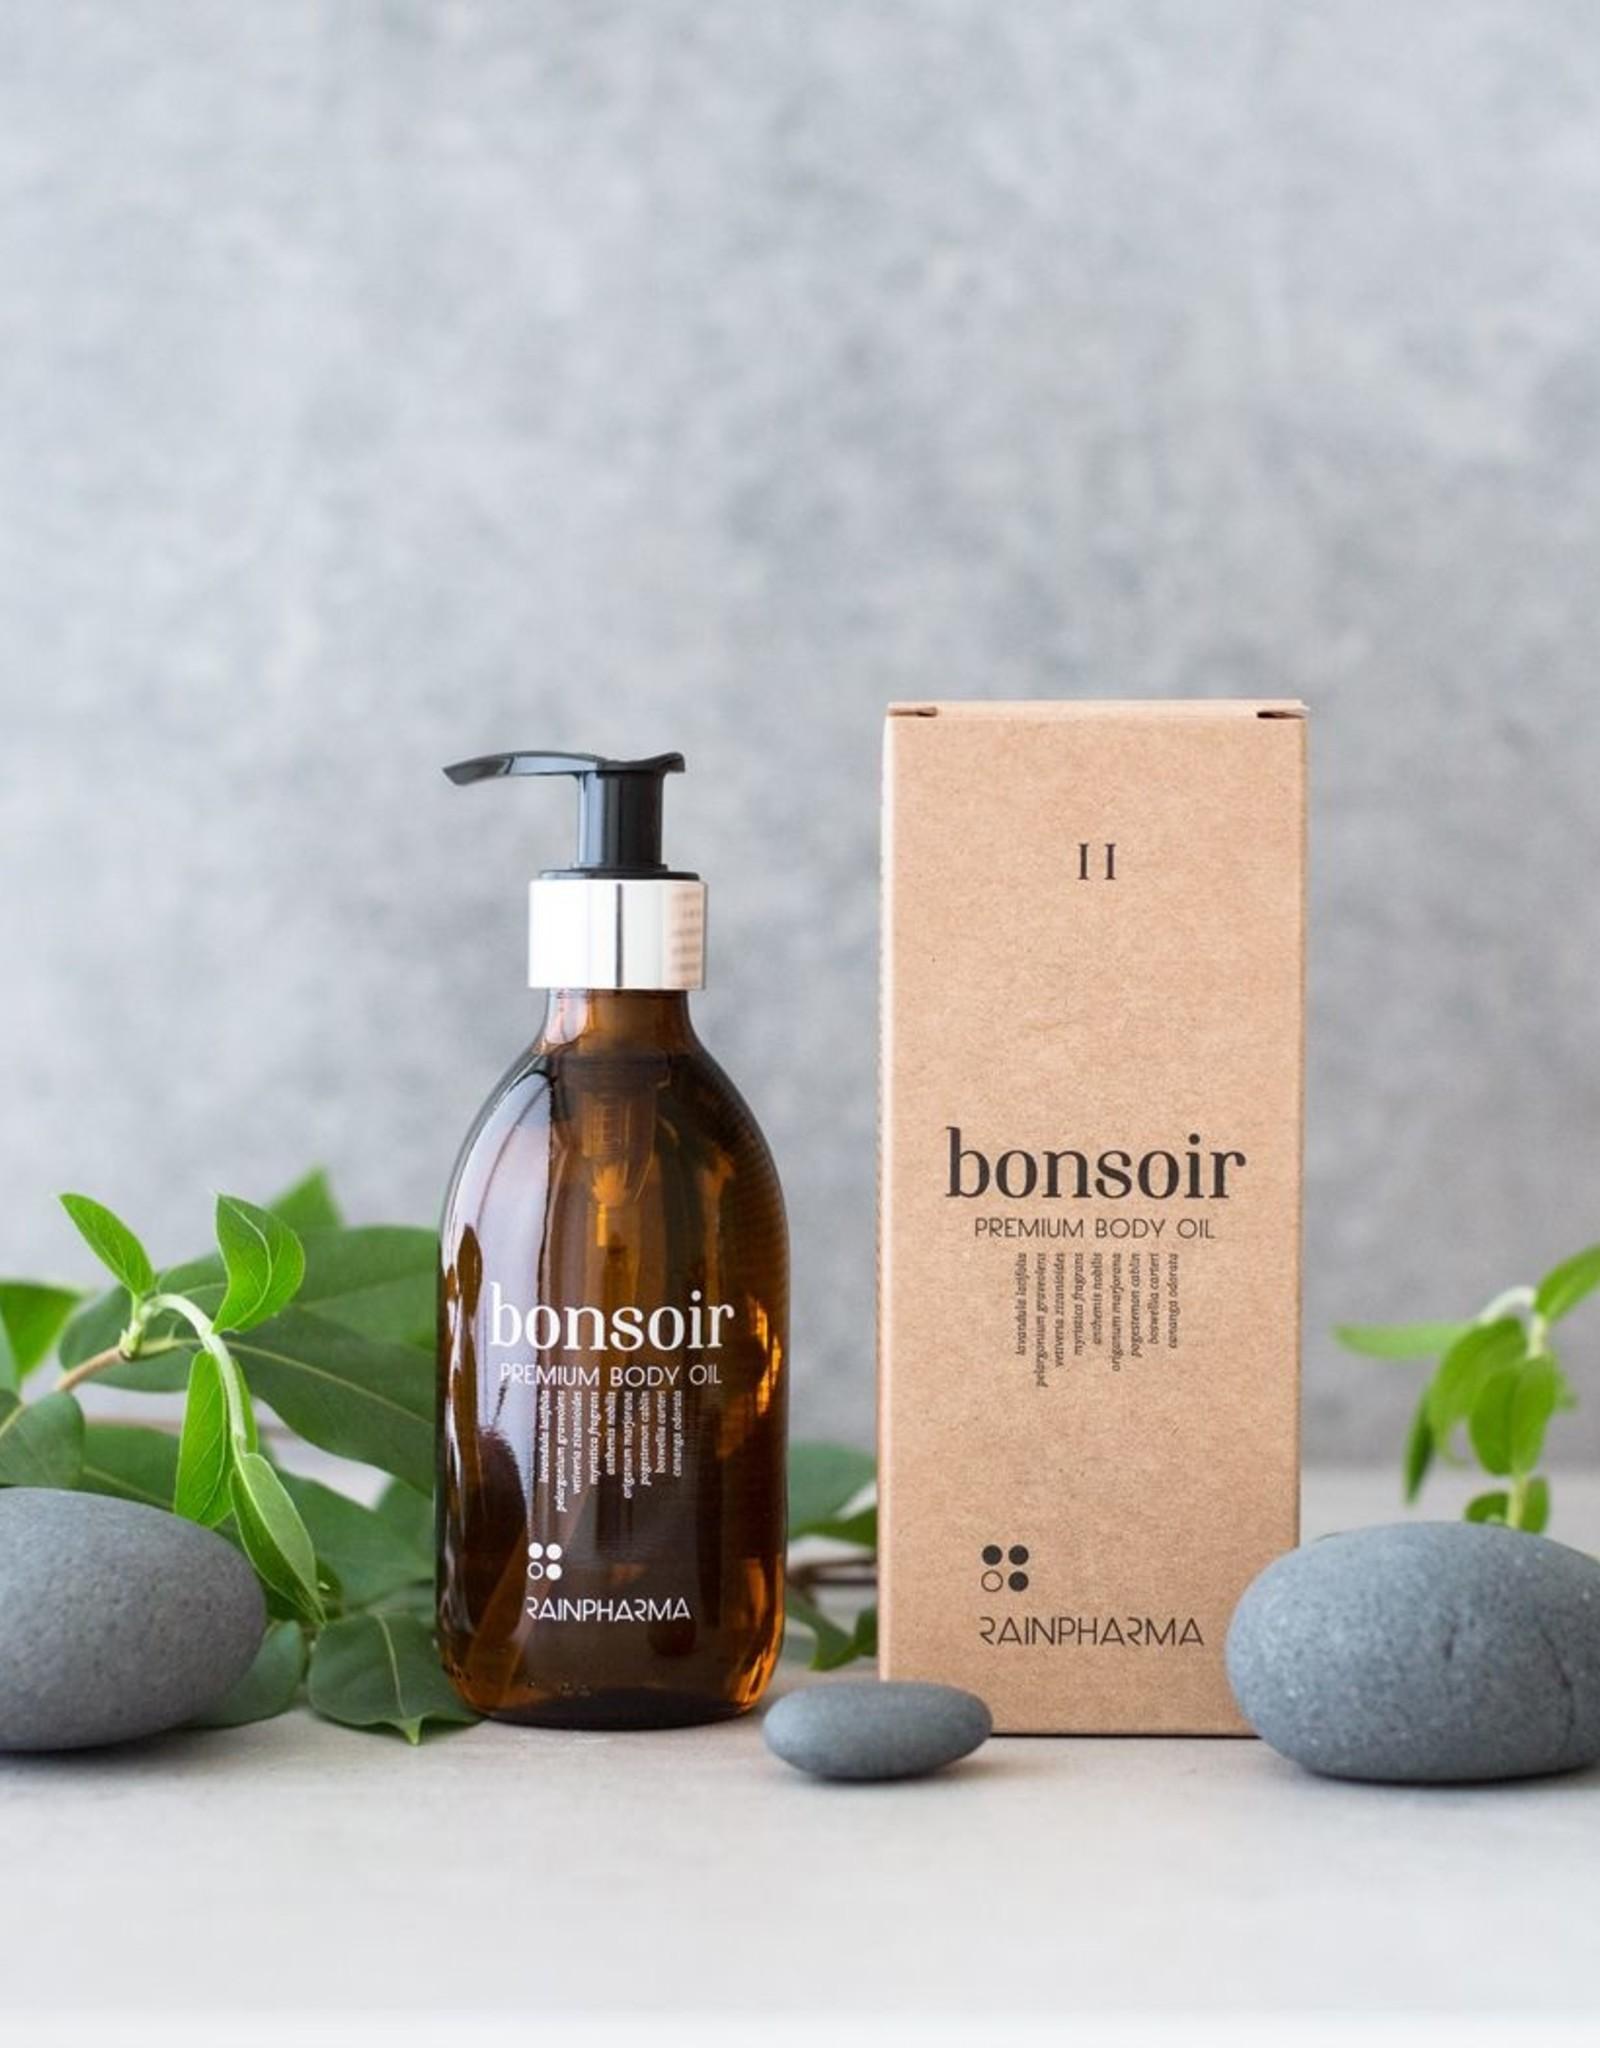 RainPharma Rainpharma - Bonsoir Premium Body Oil 250ml